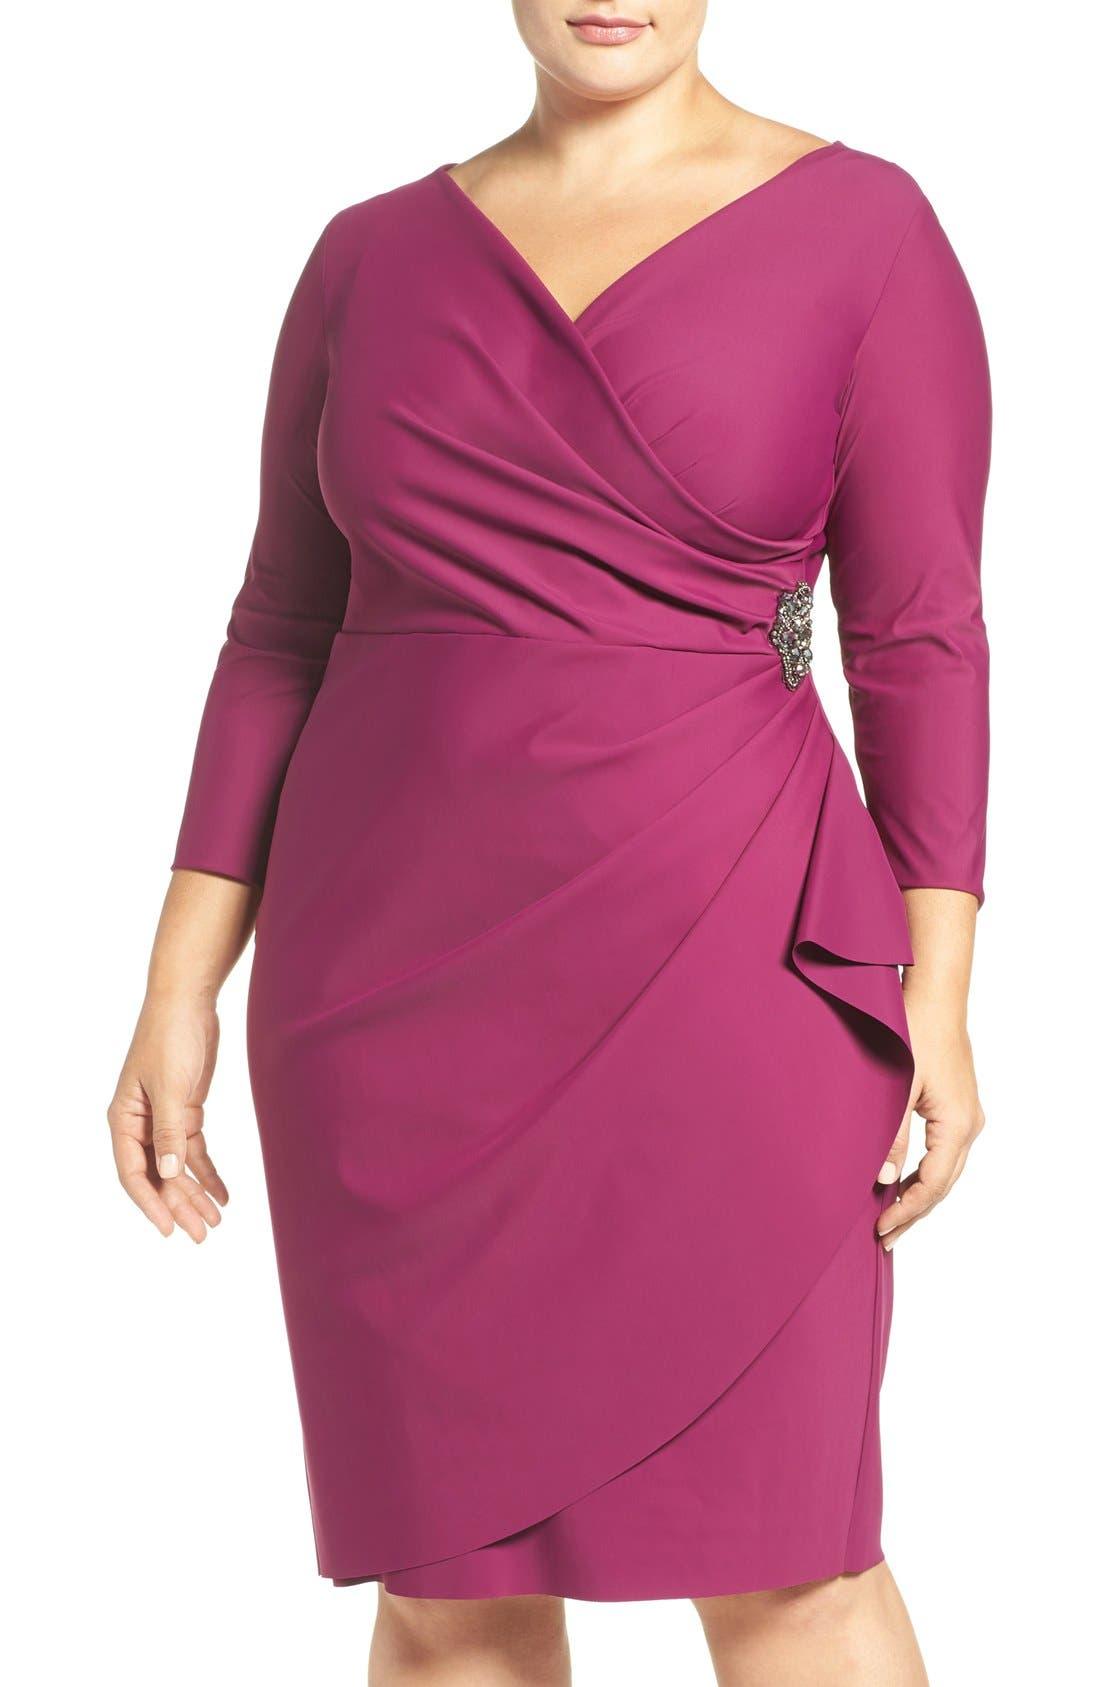 Alternate Image 1 Selected - Alex Evenings Embellished Surplice Sheath Dress (Plus Size)